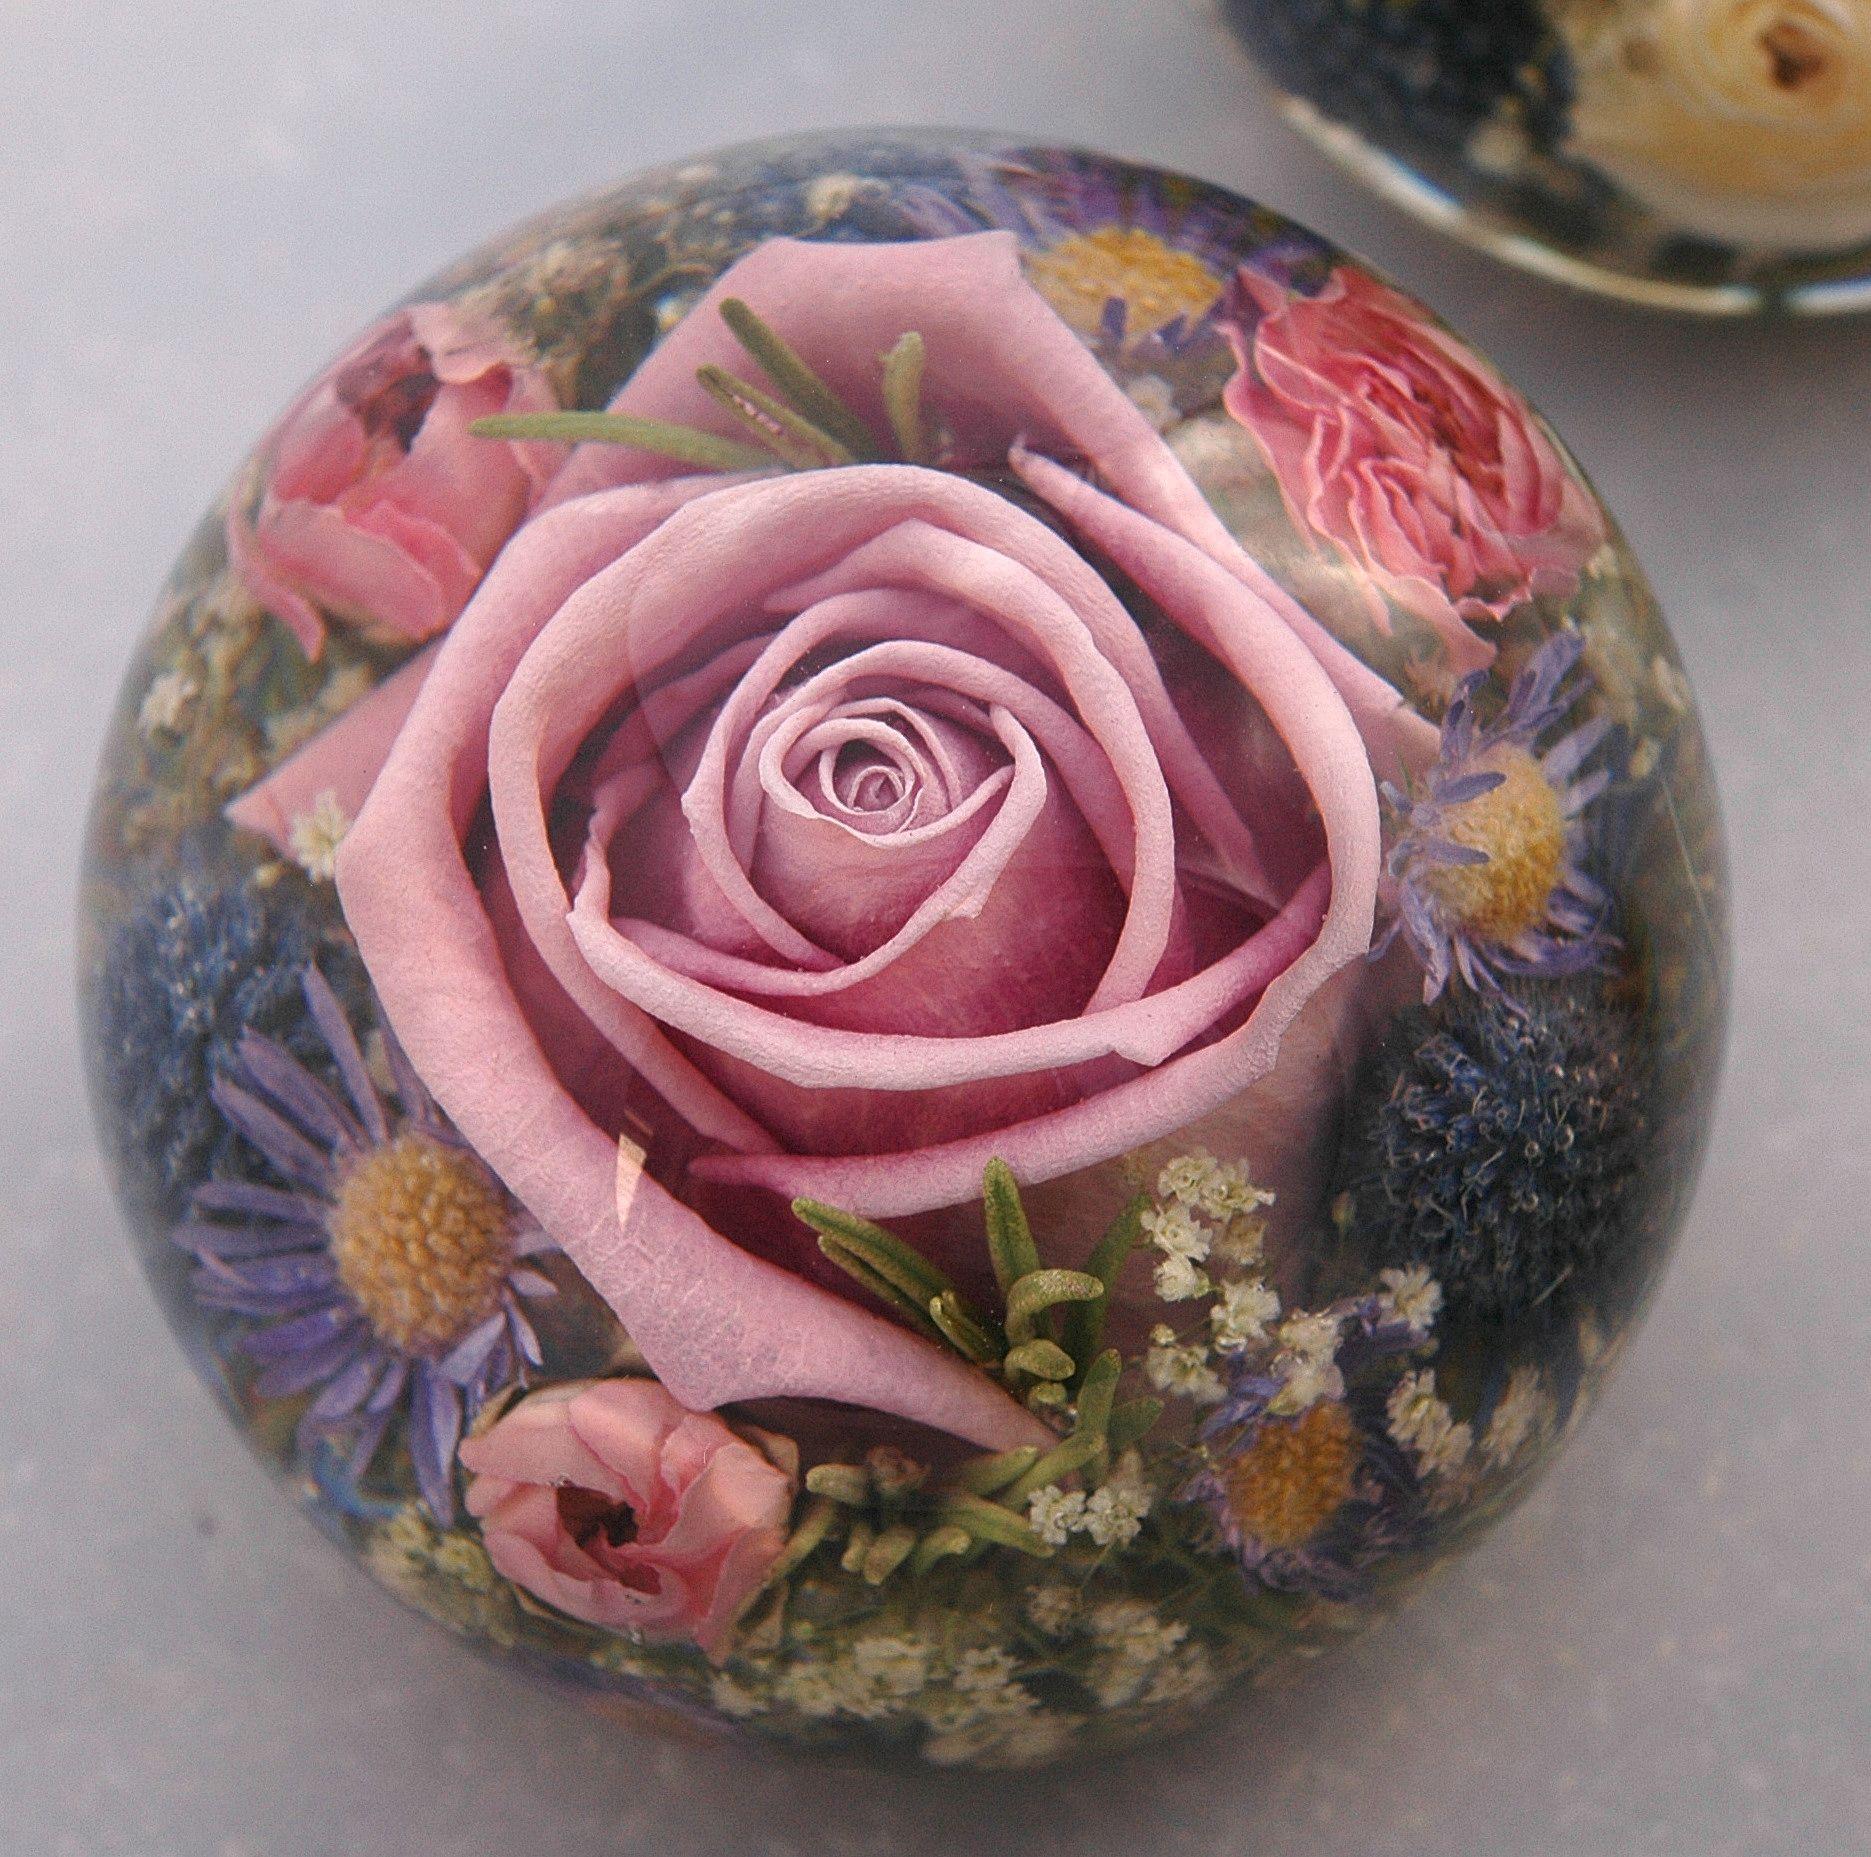 Somerton Luxury Mixed Flower Paperweight Paperweights Flower